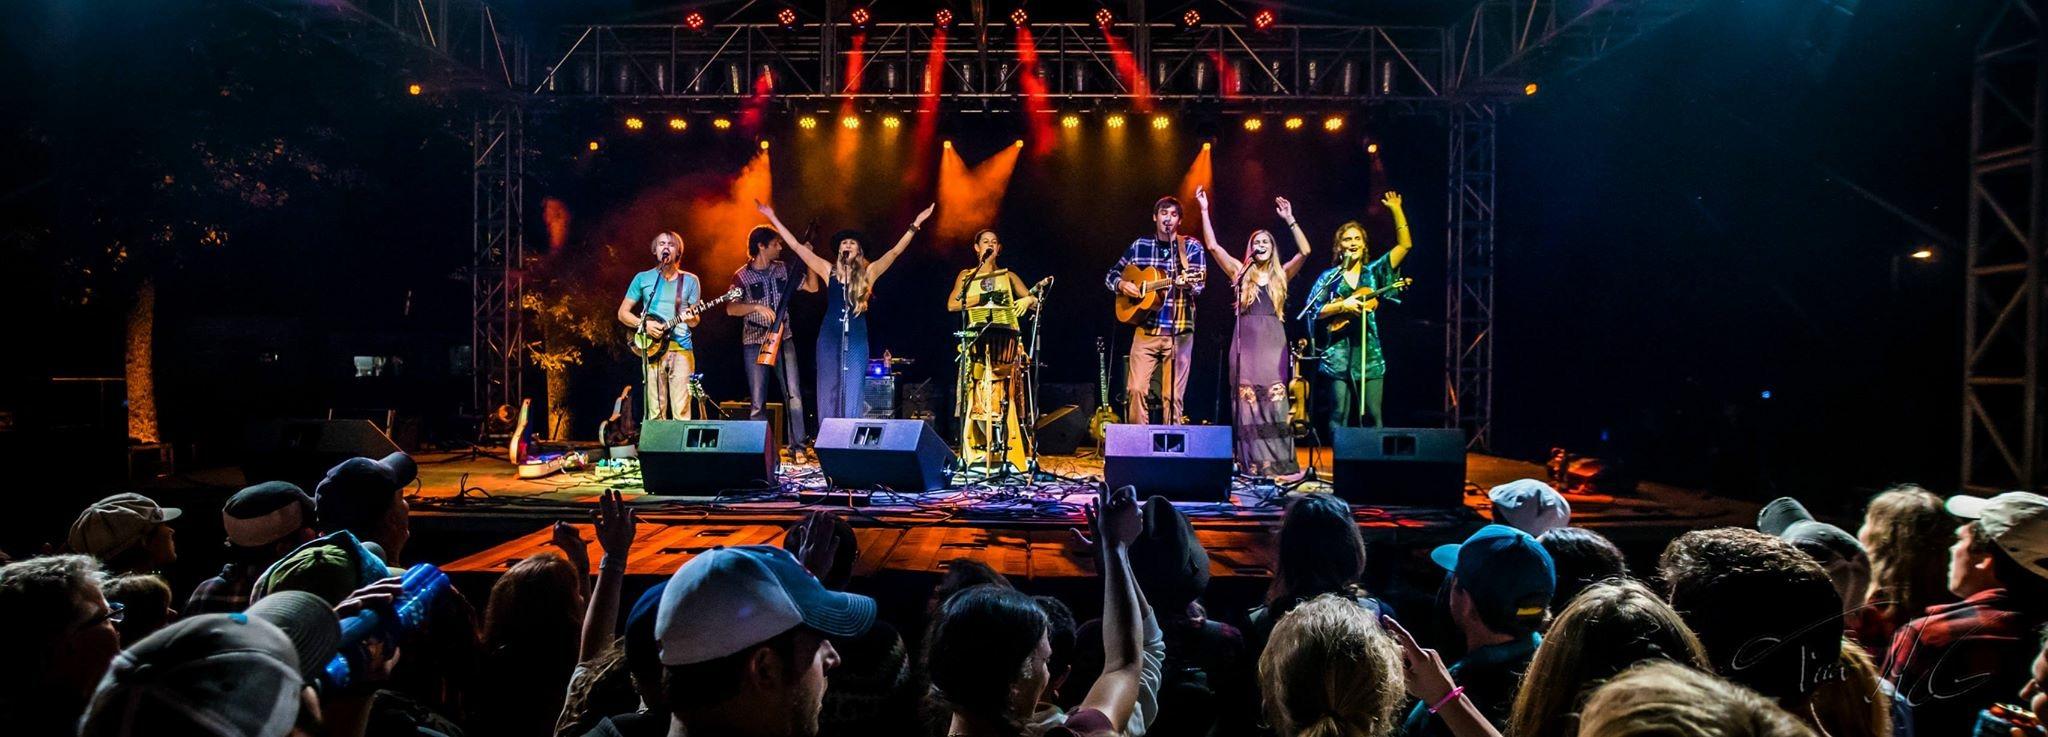 boats, bluegrass, winona, minnesota, concert, performance